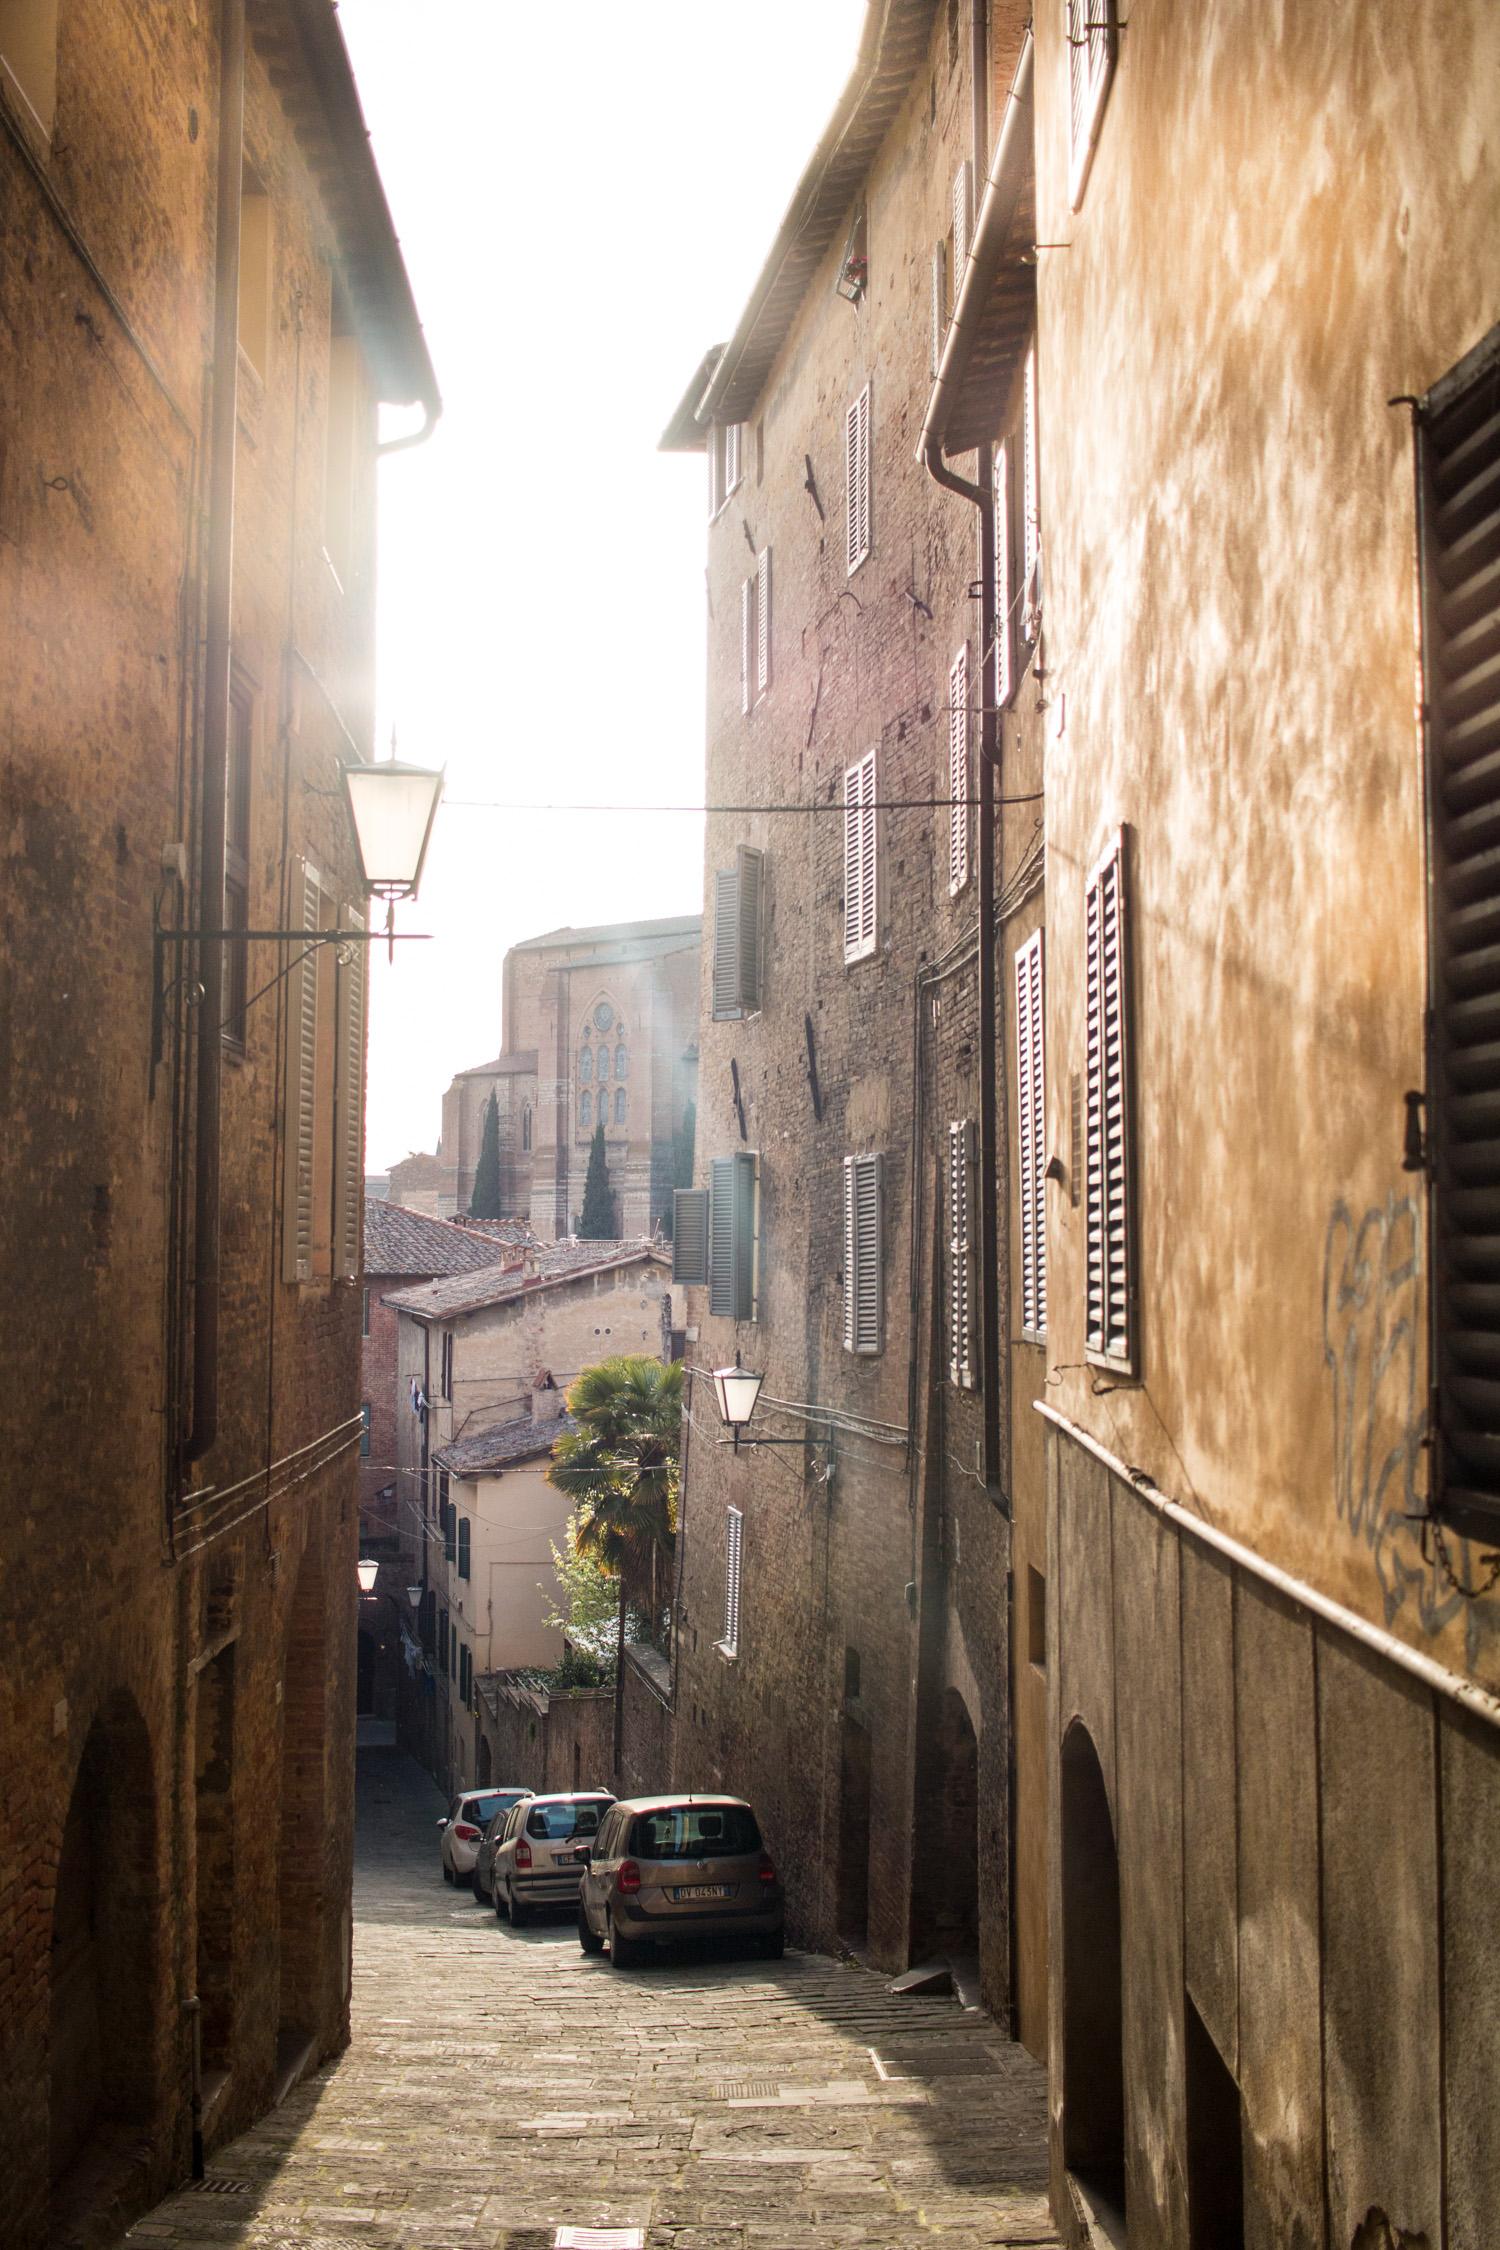 The-Barn-Bagnaie-Siena-Day-2-87